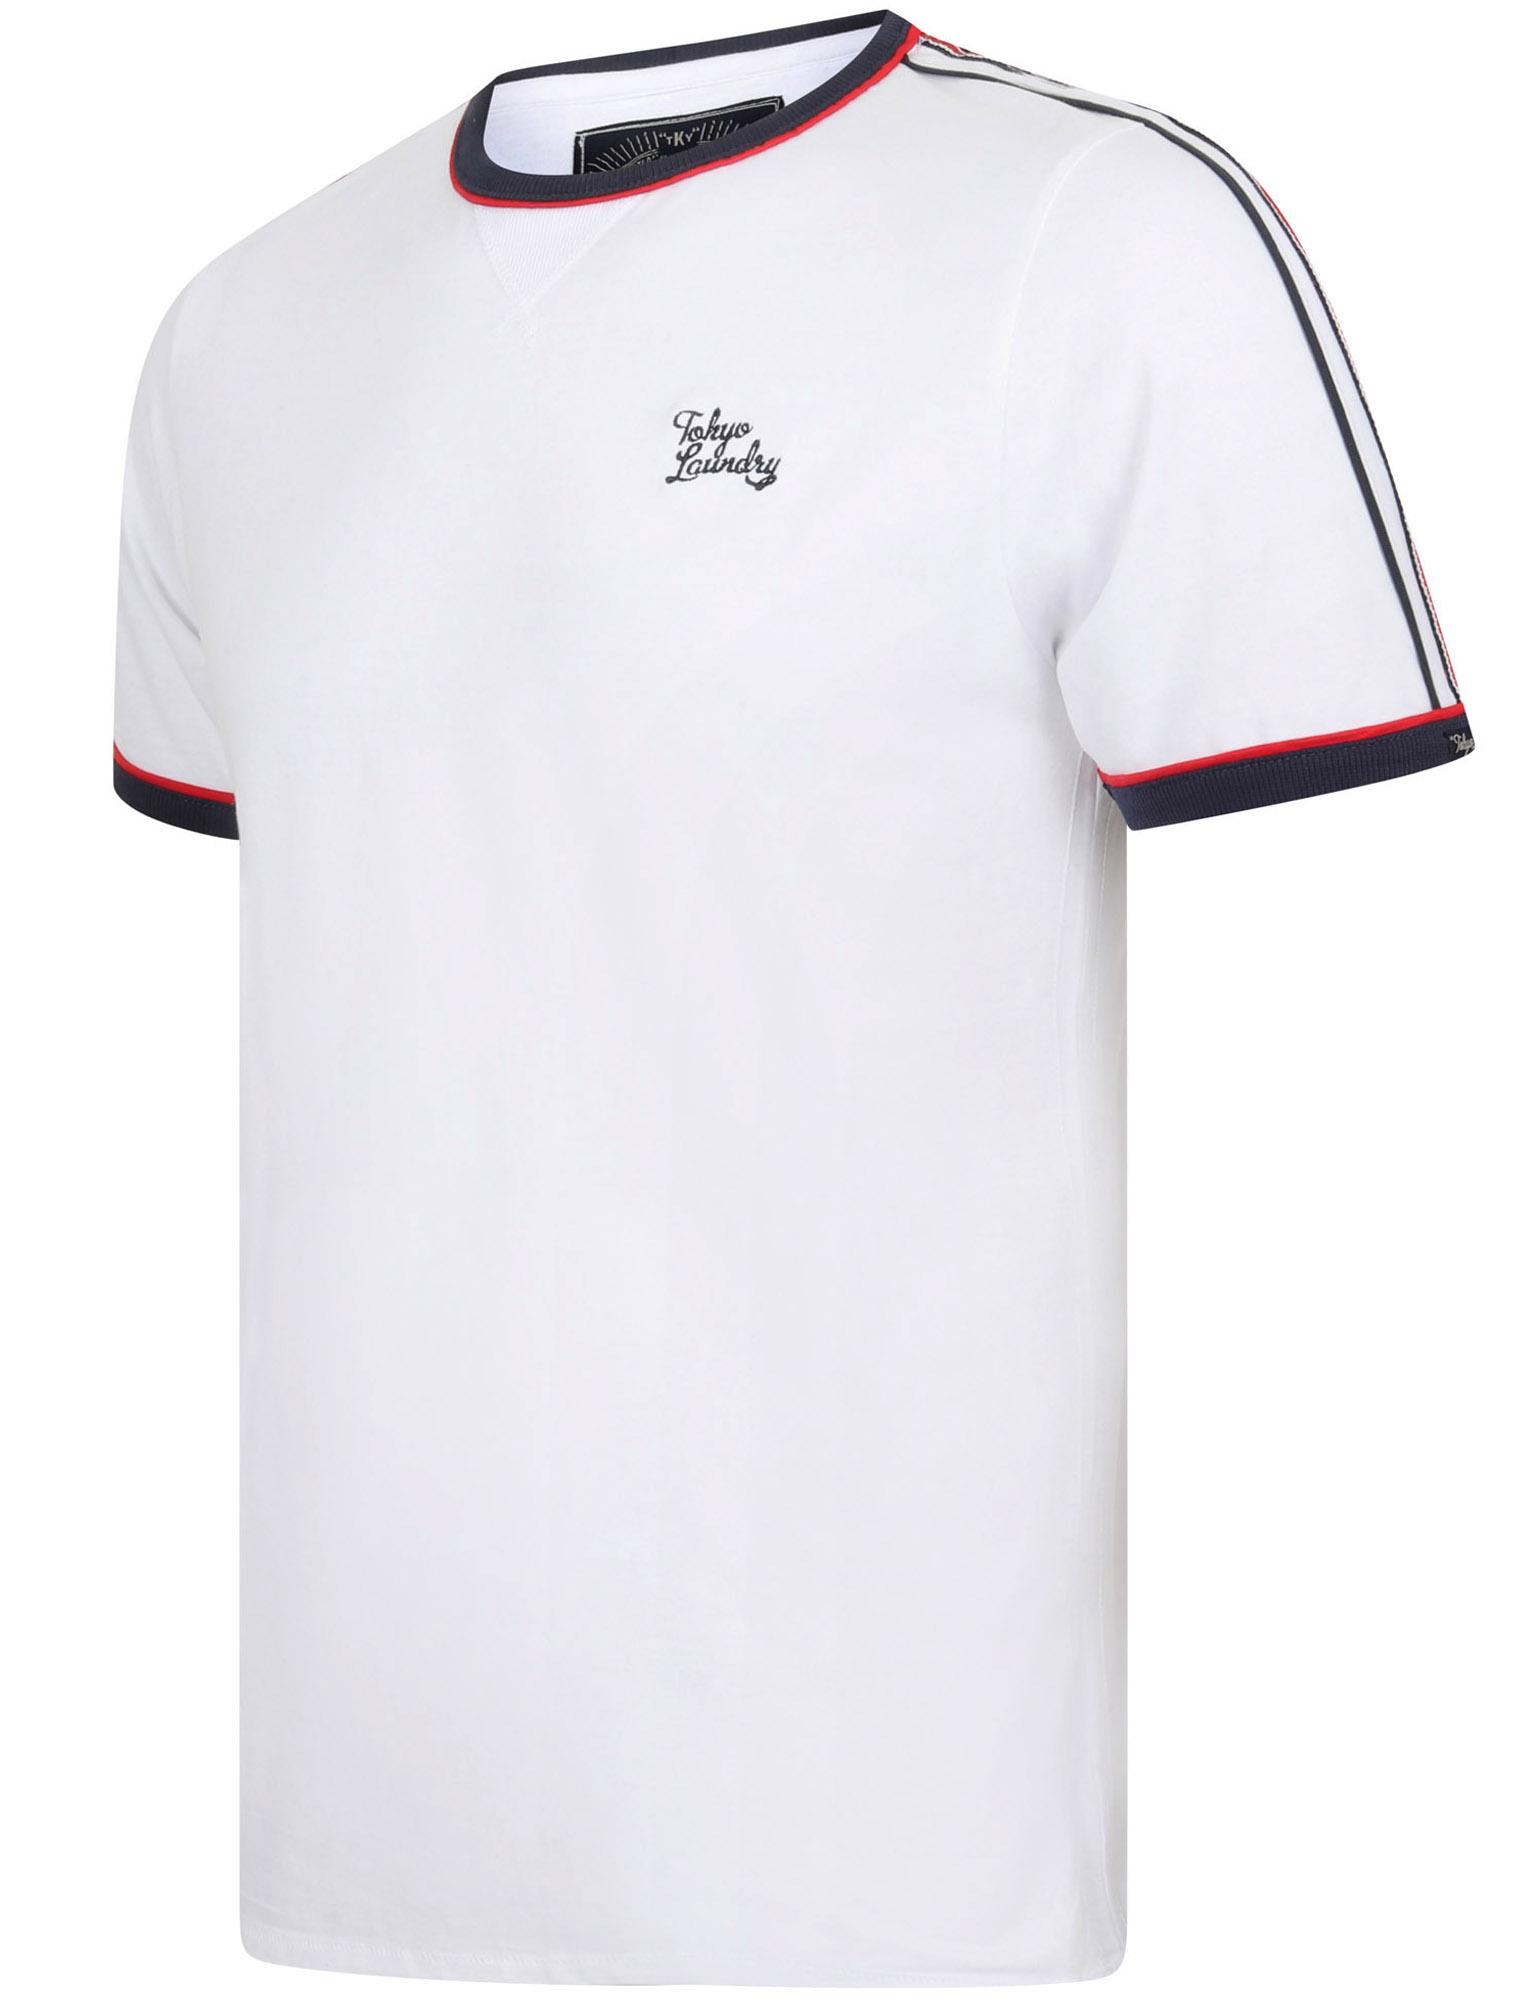 New-Mens-Tokyo-Laundry-Huson-Contrast-Crew-Neck-Cotton-Rich-T-Shirt-Size-S-XXL thumbnail 15